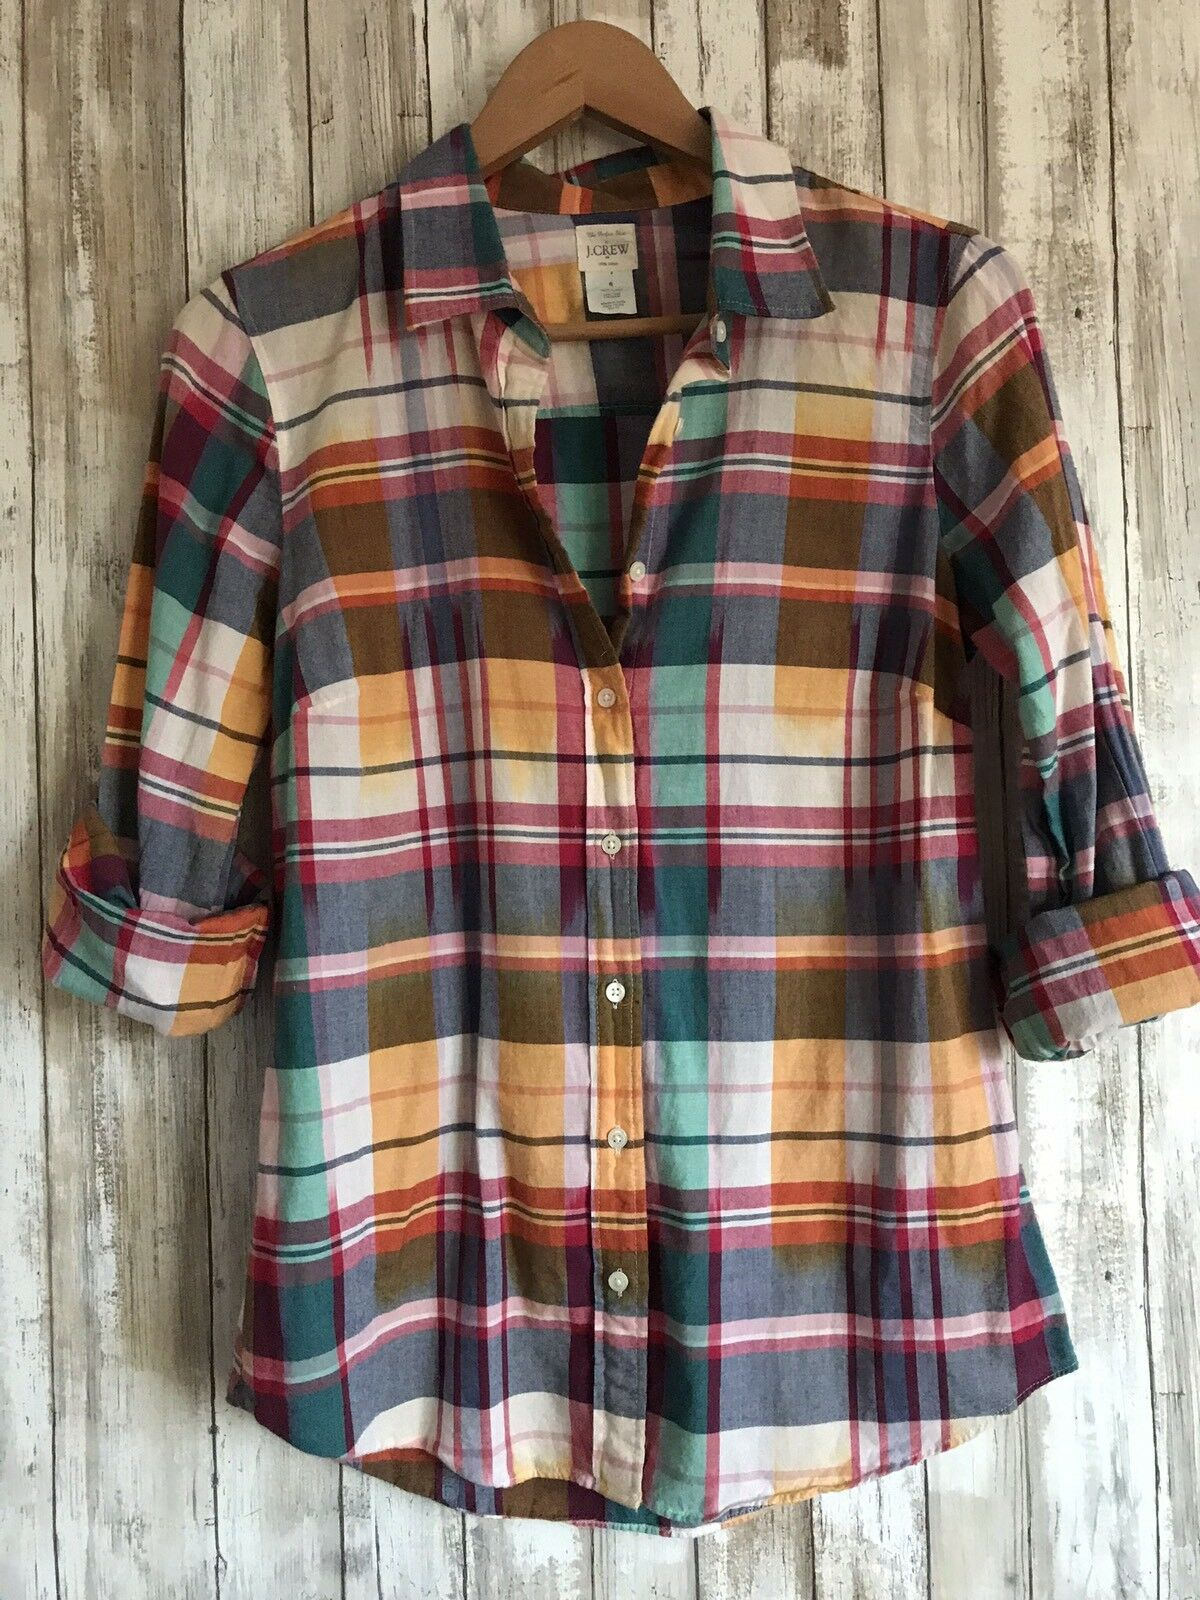 J Crew Perfect Shirt Long Sleeve Button Down Summer Plaid Print S Small  RARE